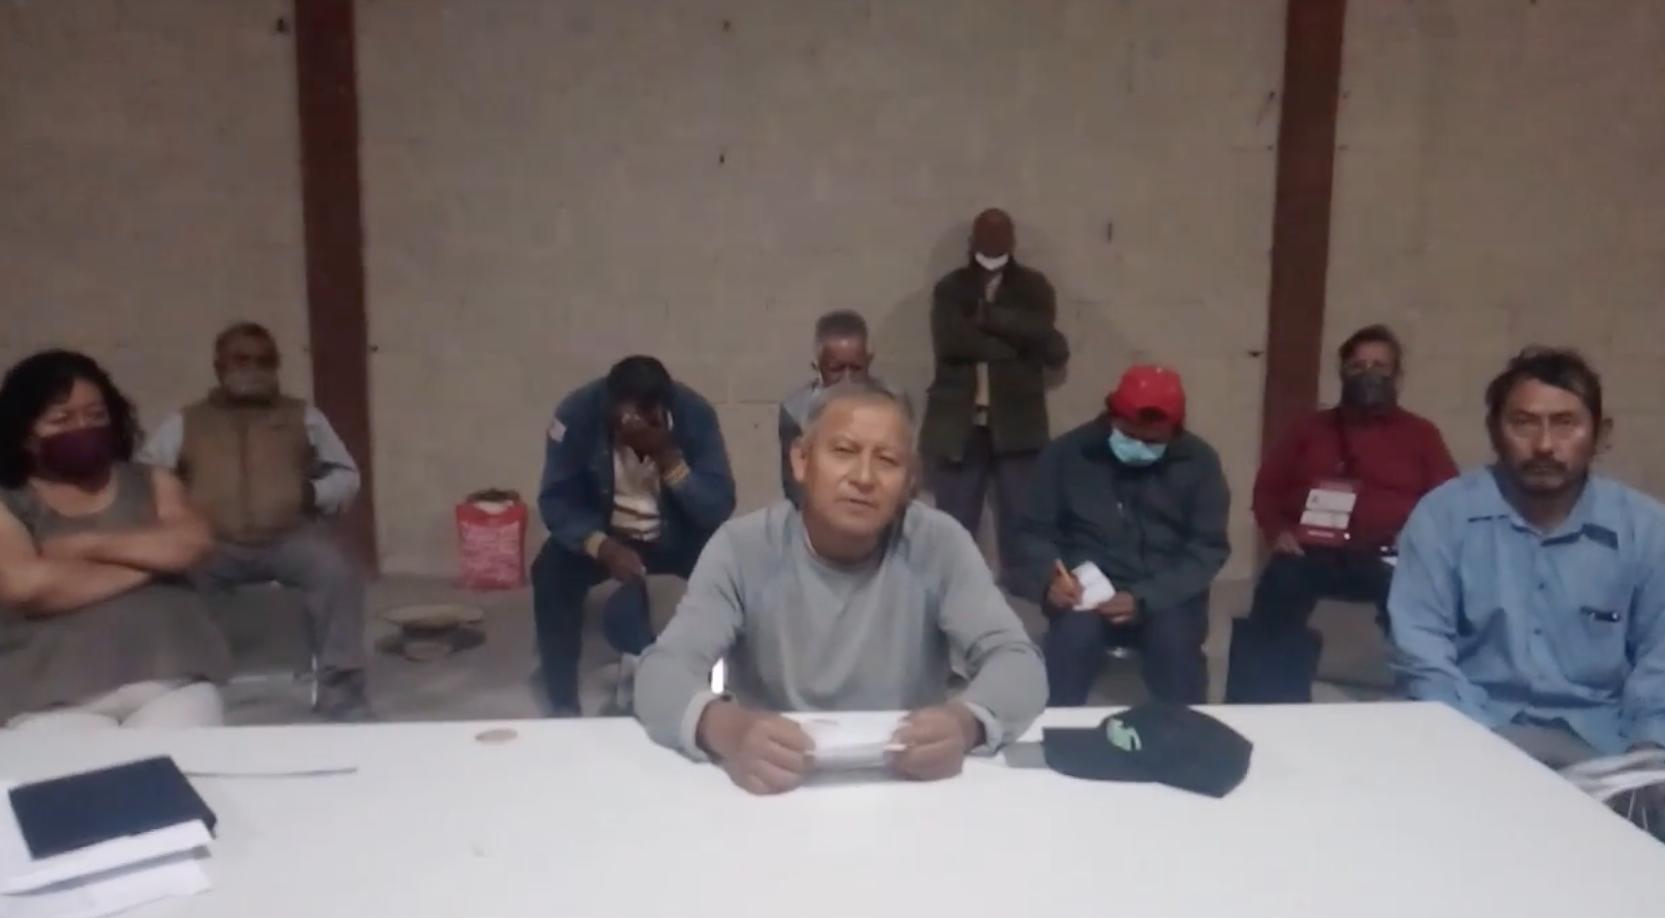 Morenistas impugnan la candidatura de Zenón Badillo en Tochtepec